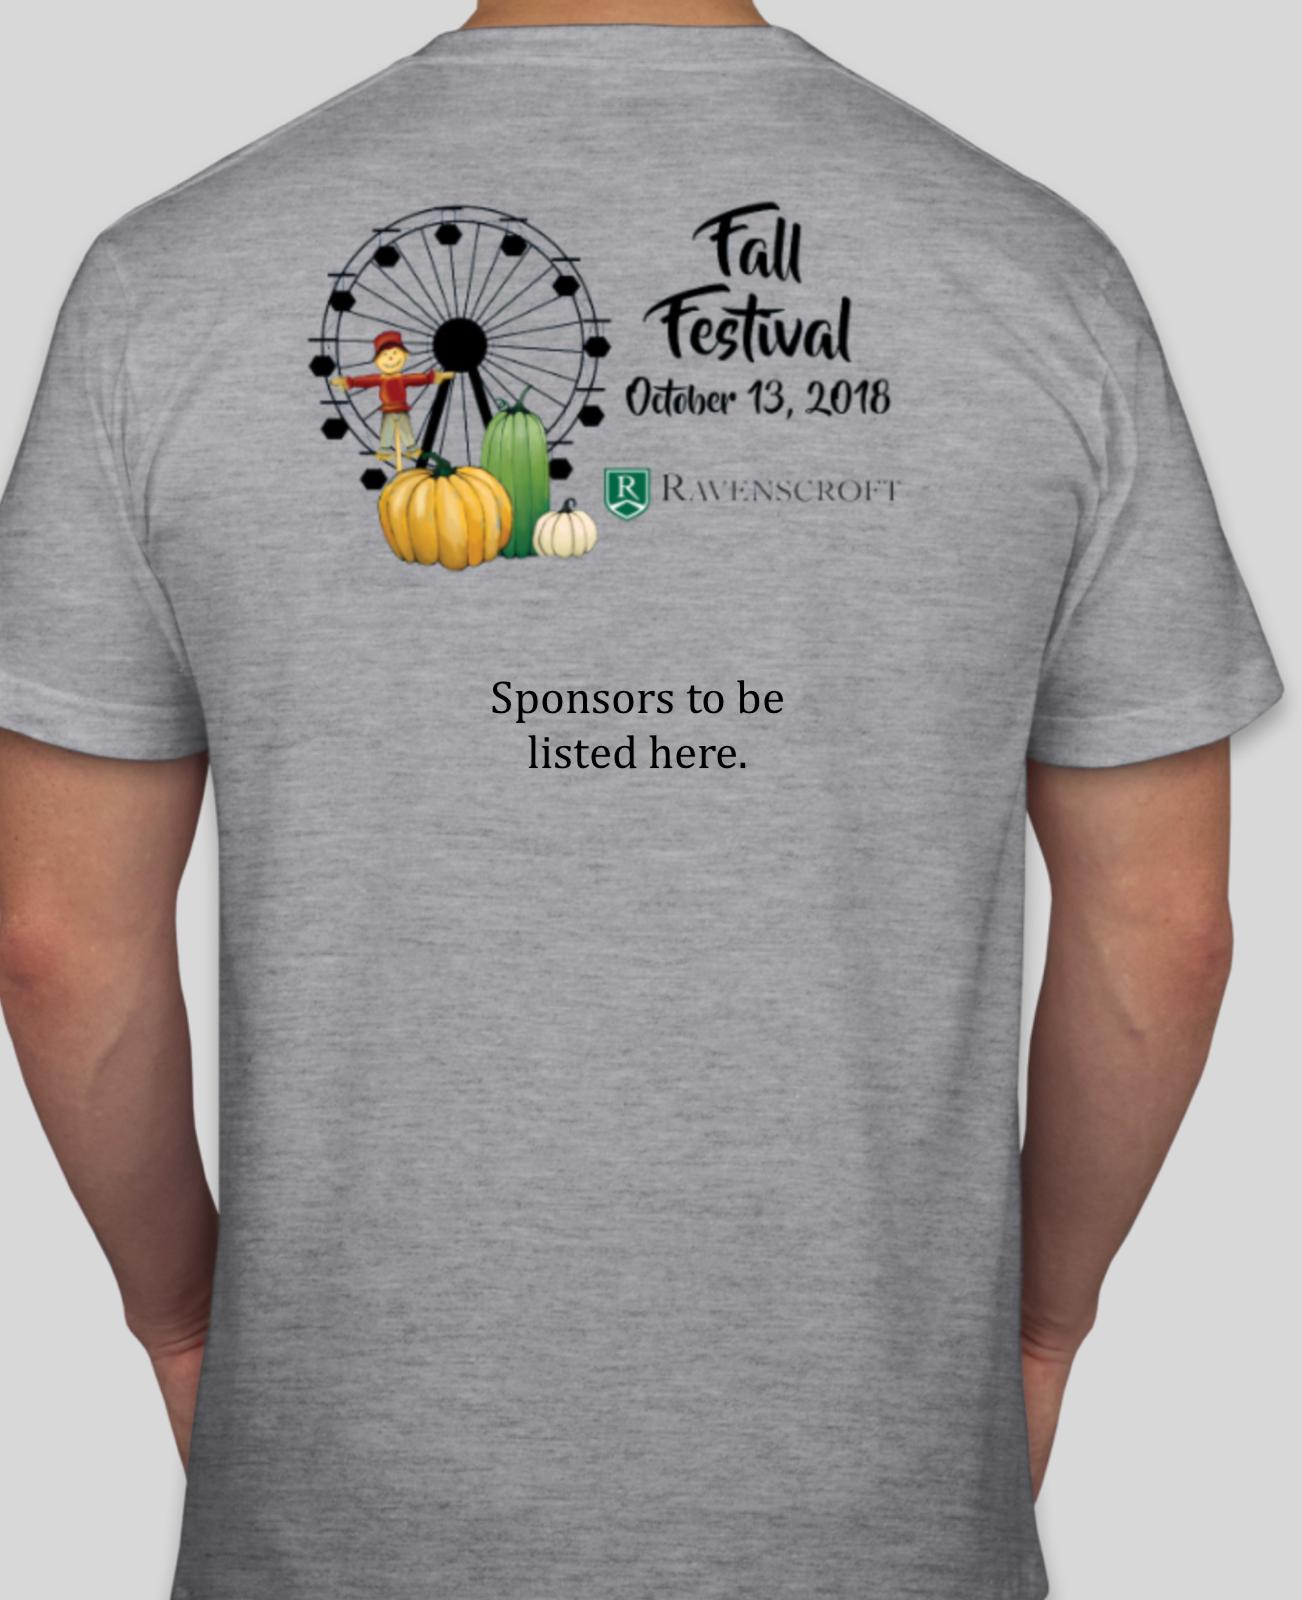 ravenscroft t-shirts